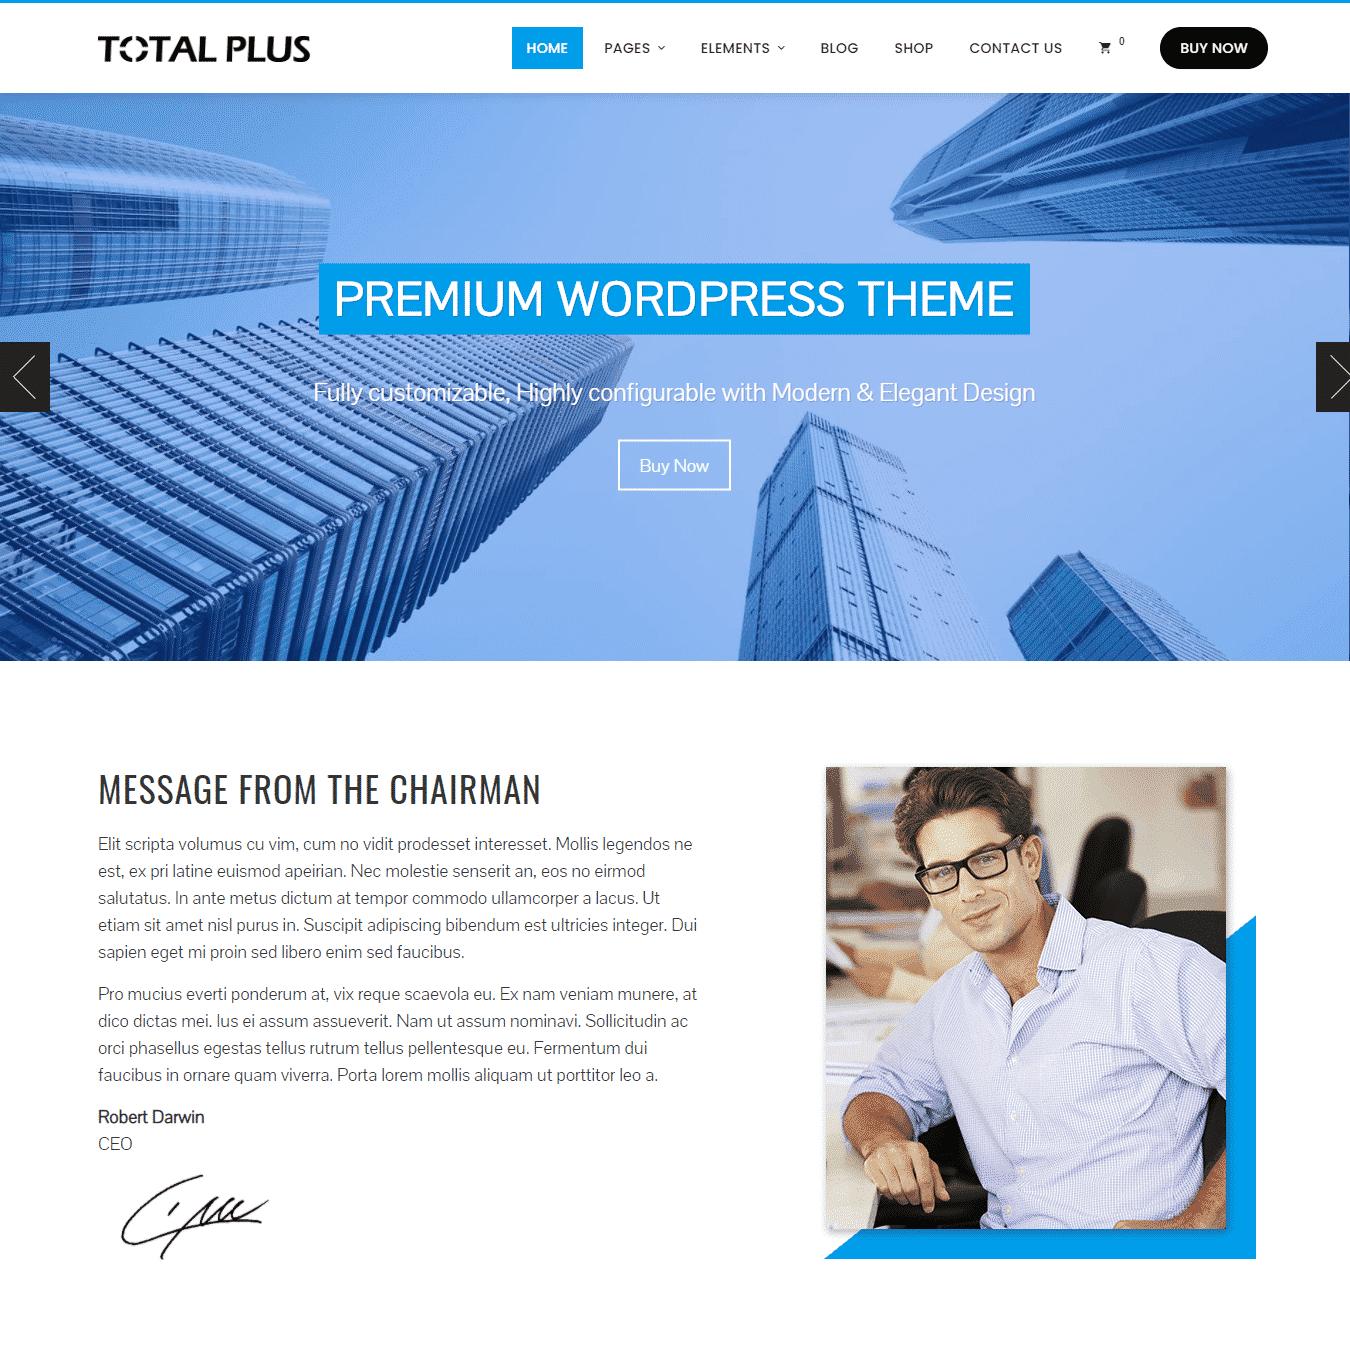 total plus WordPress theme